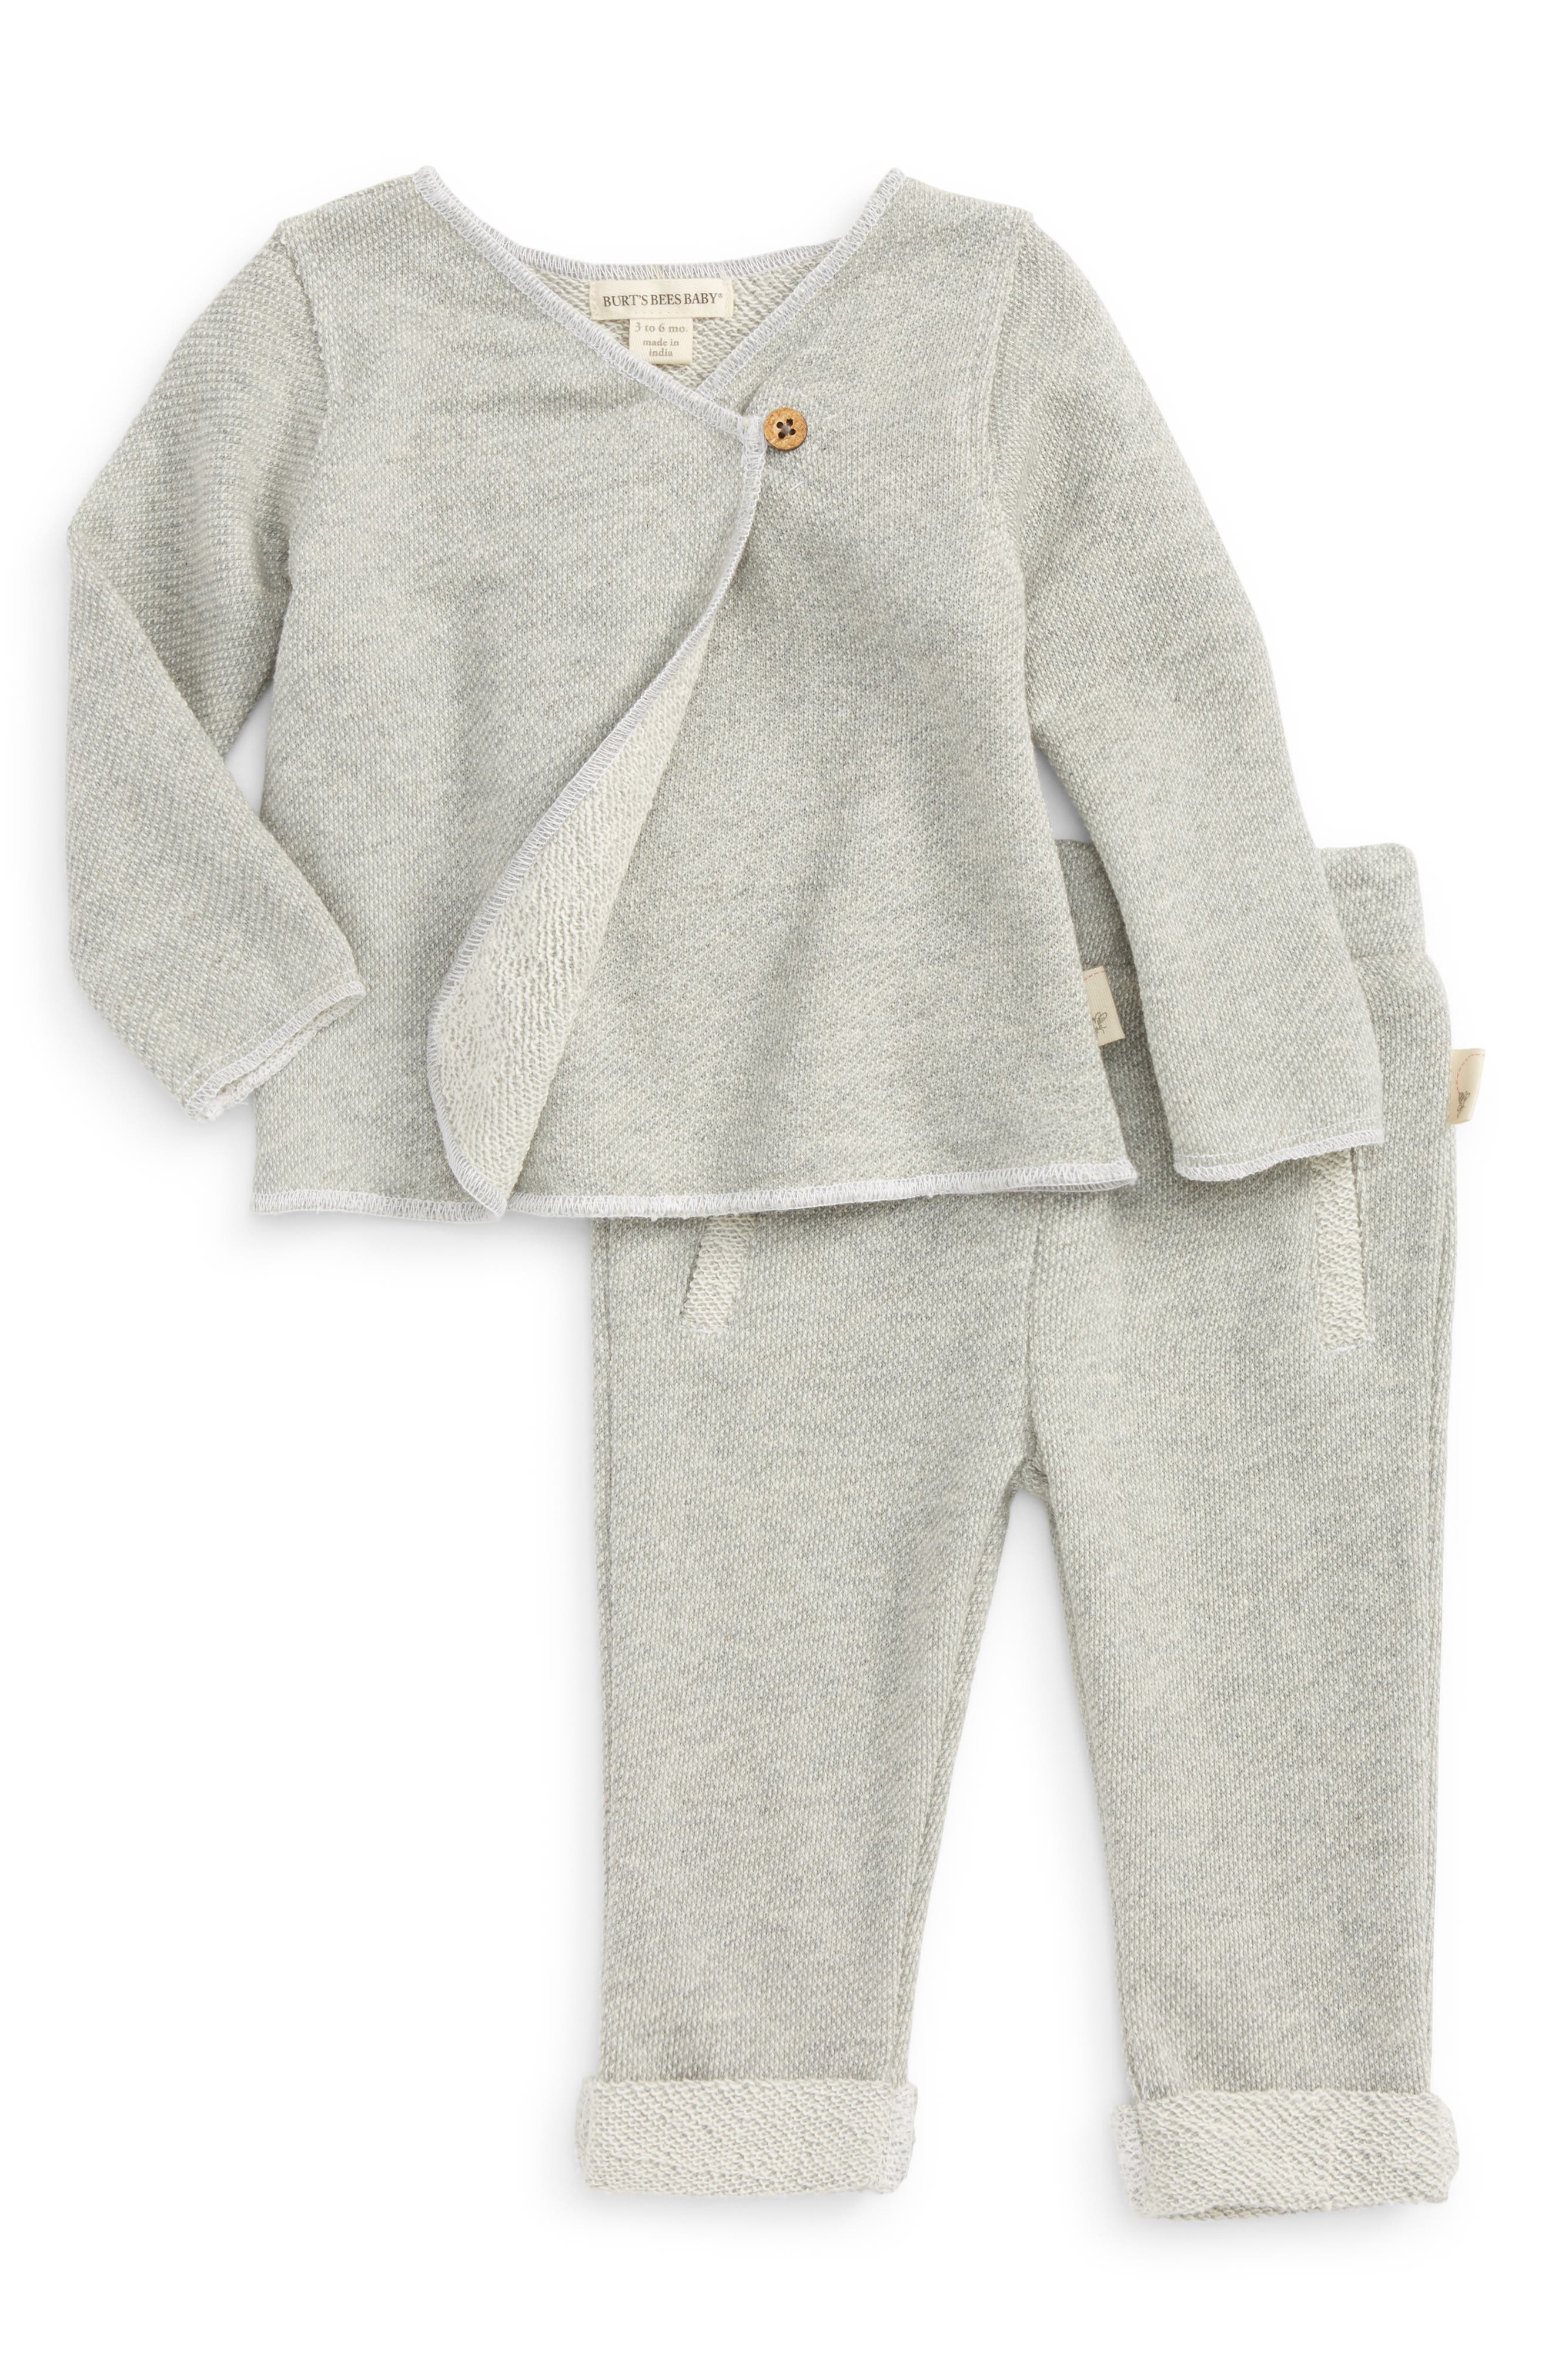 Organic Cotton Kimono Top & Pants Set,                             Main thumbnail 1, color,                             Heather Grey